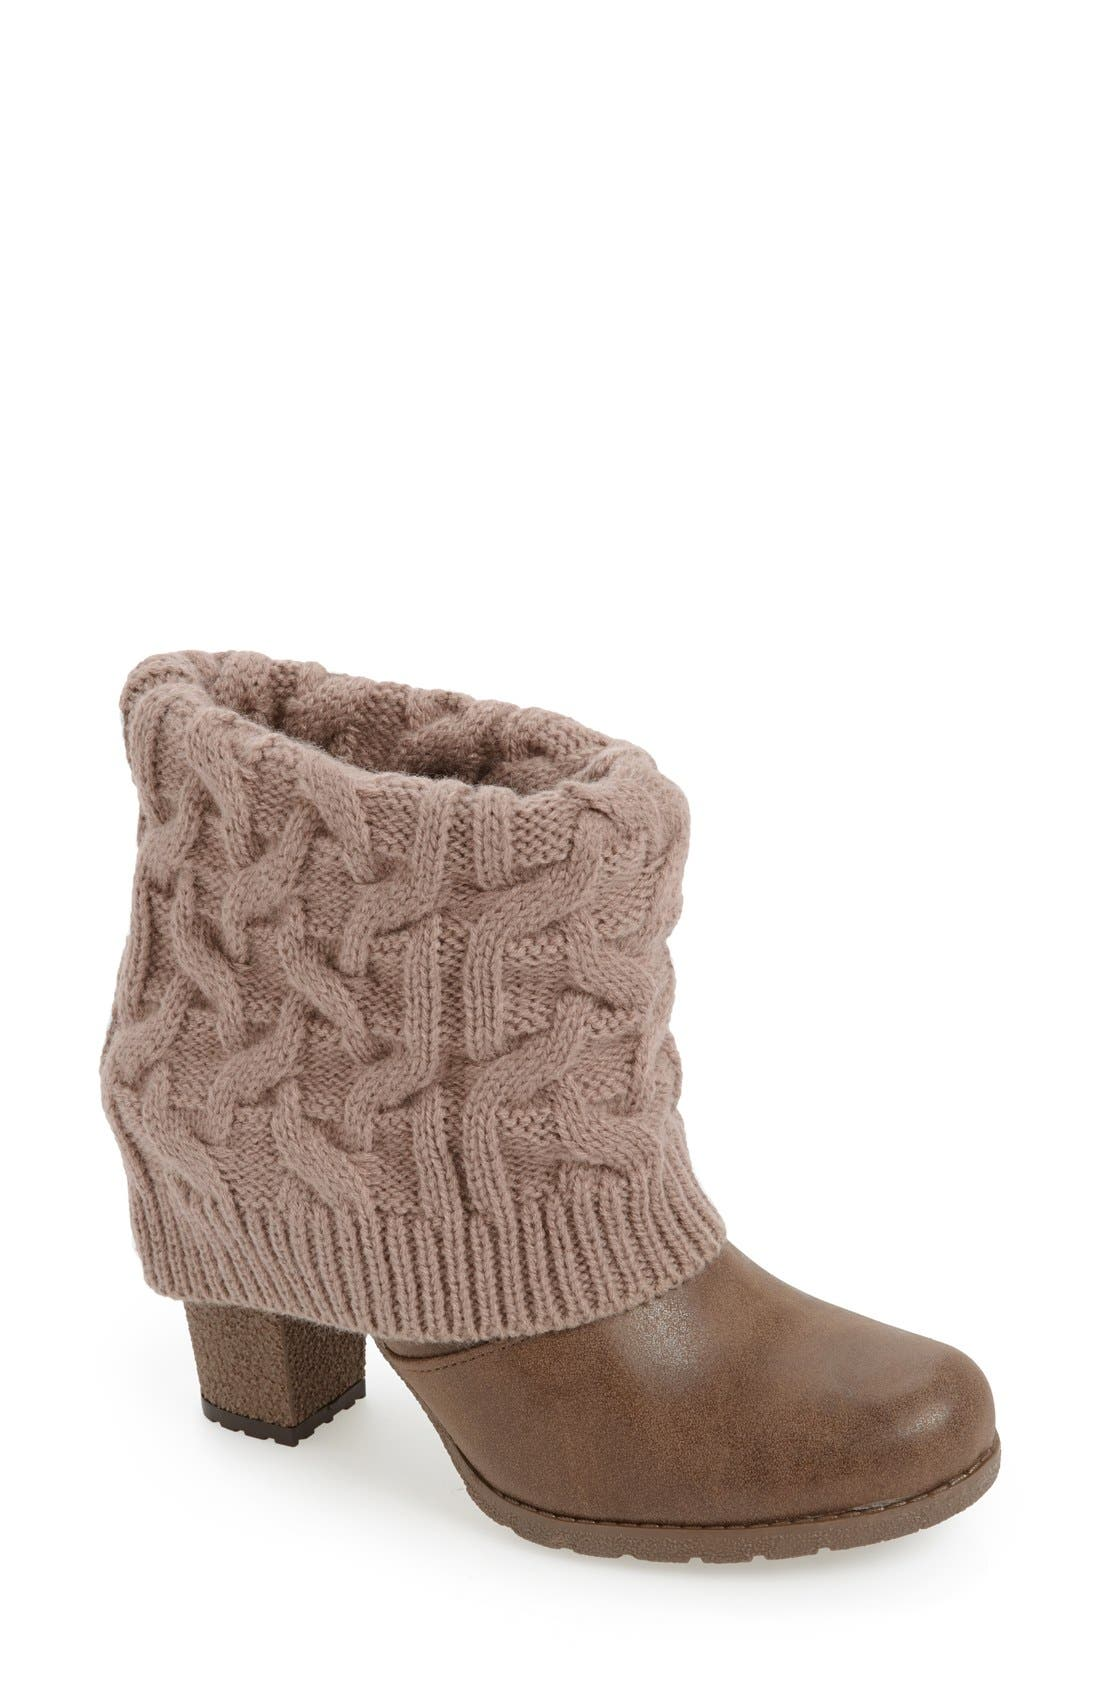 Alternate Image 1 Selected - MUK LUKS 'Chris' Knit Cuff Bootie (Women)